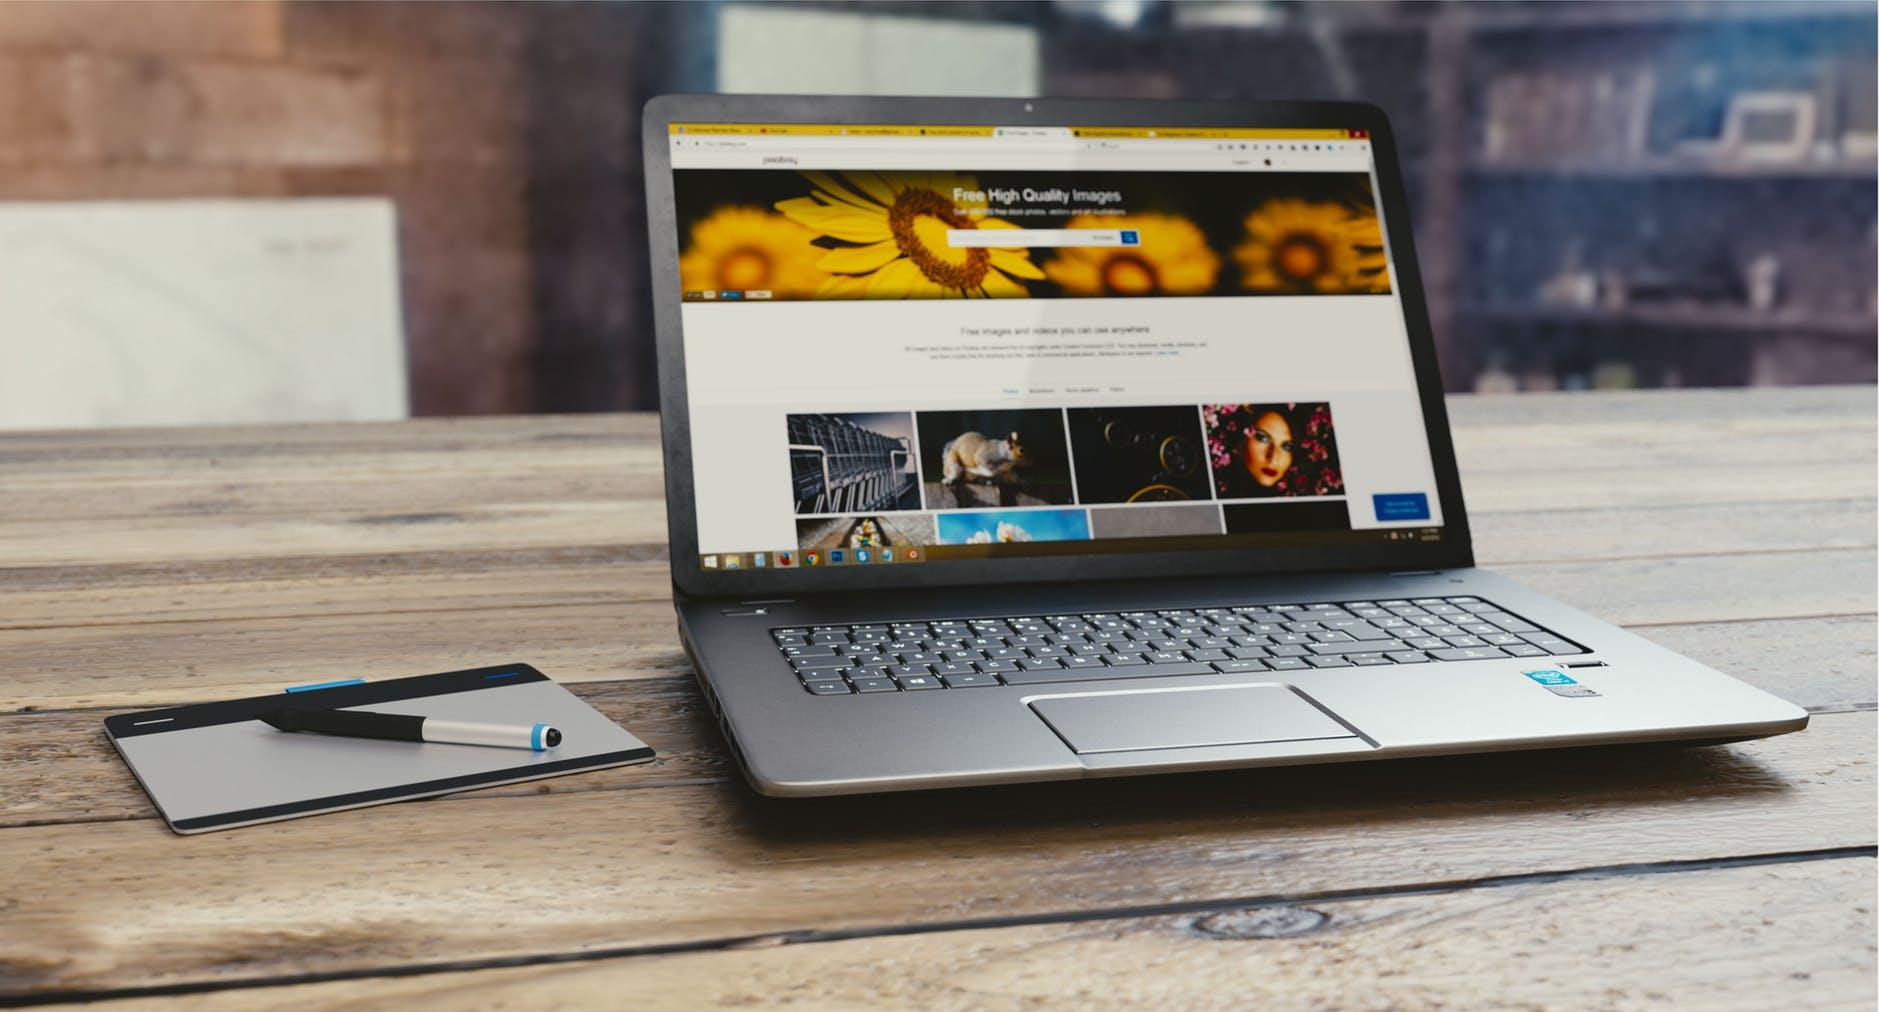 Jump Forward Media; Home of Nashville Web Design and SEO Services